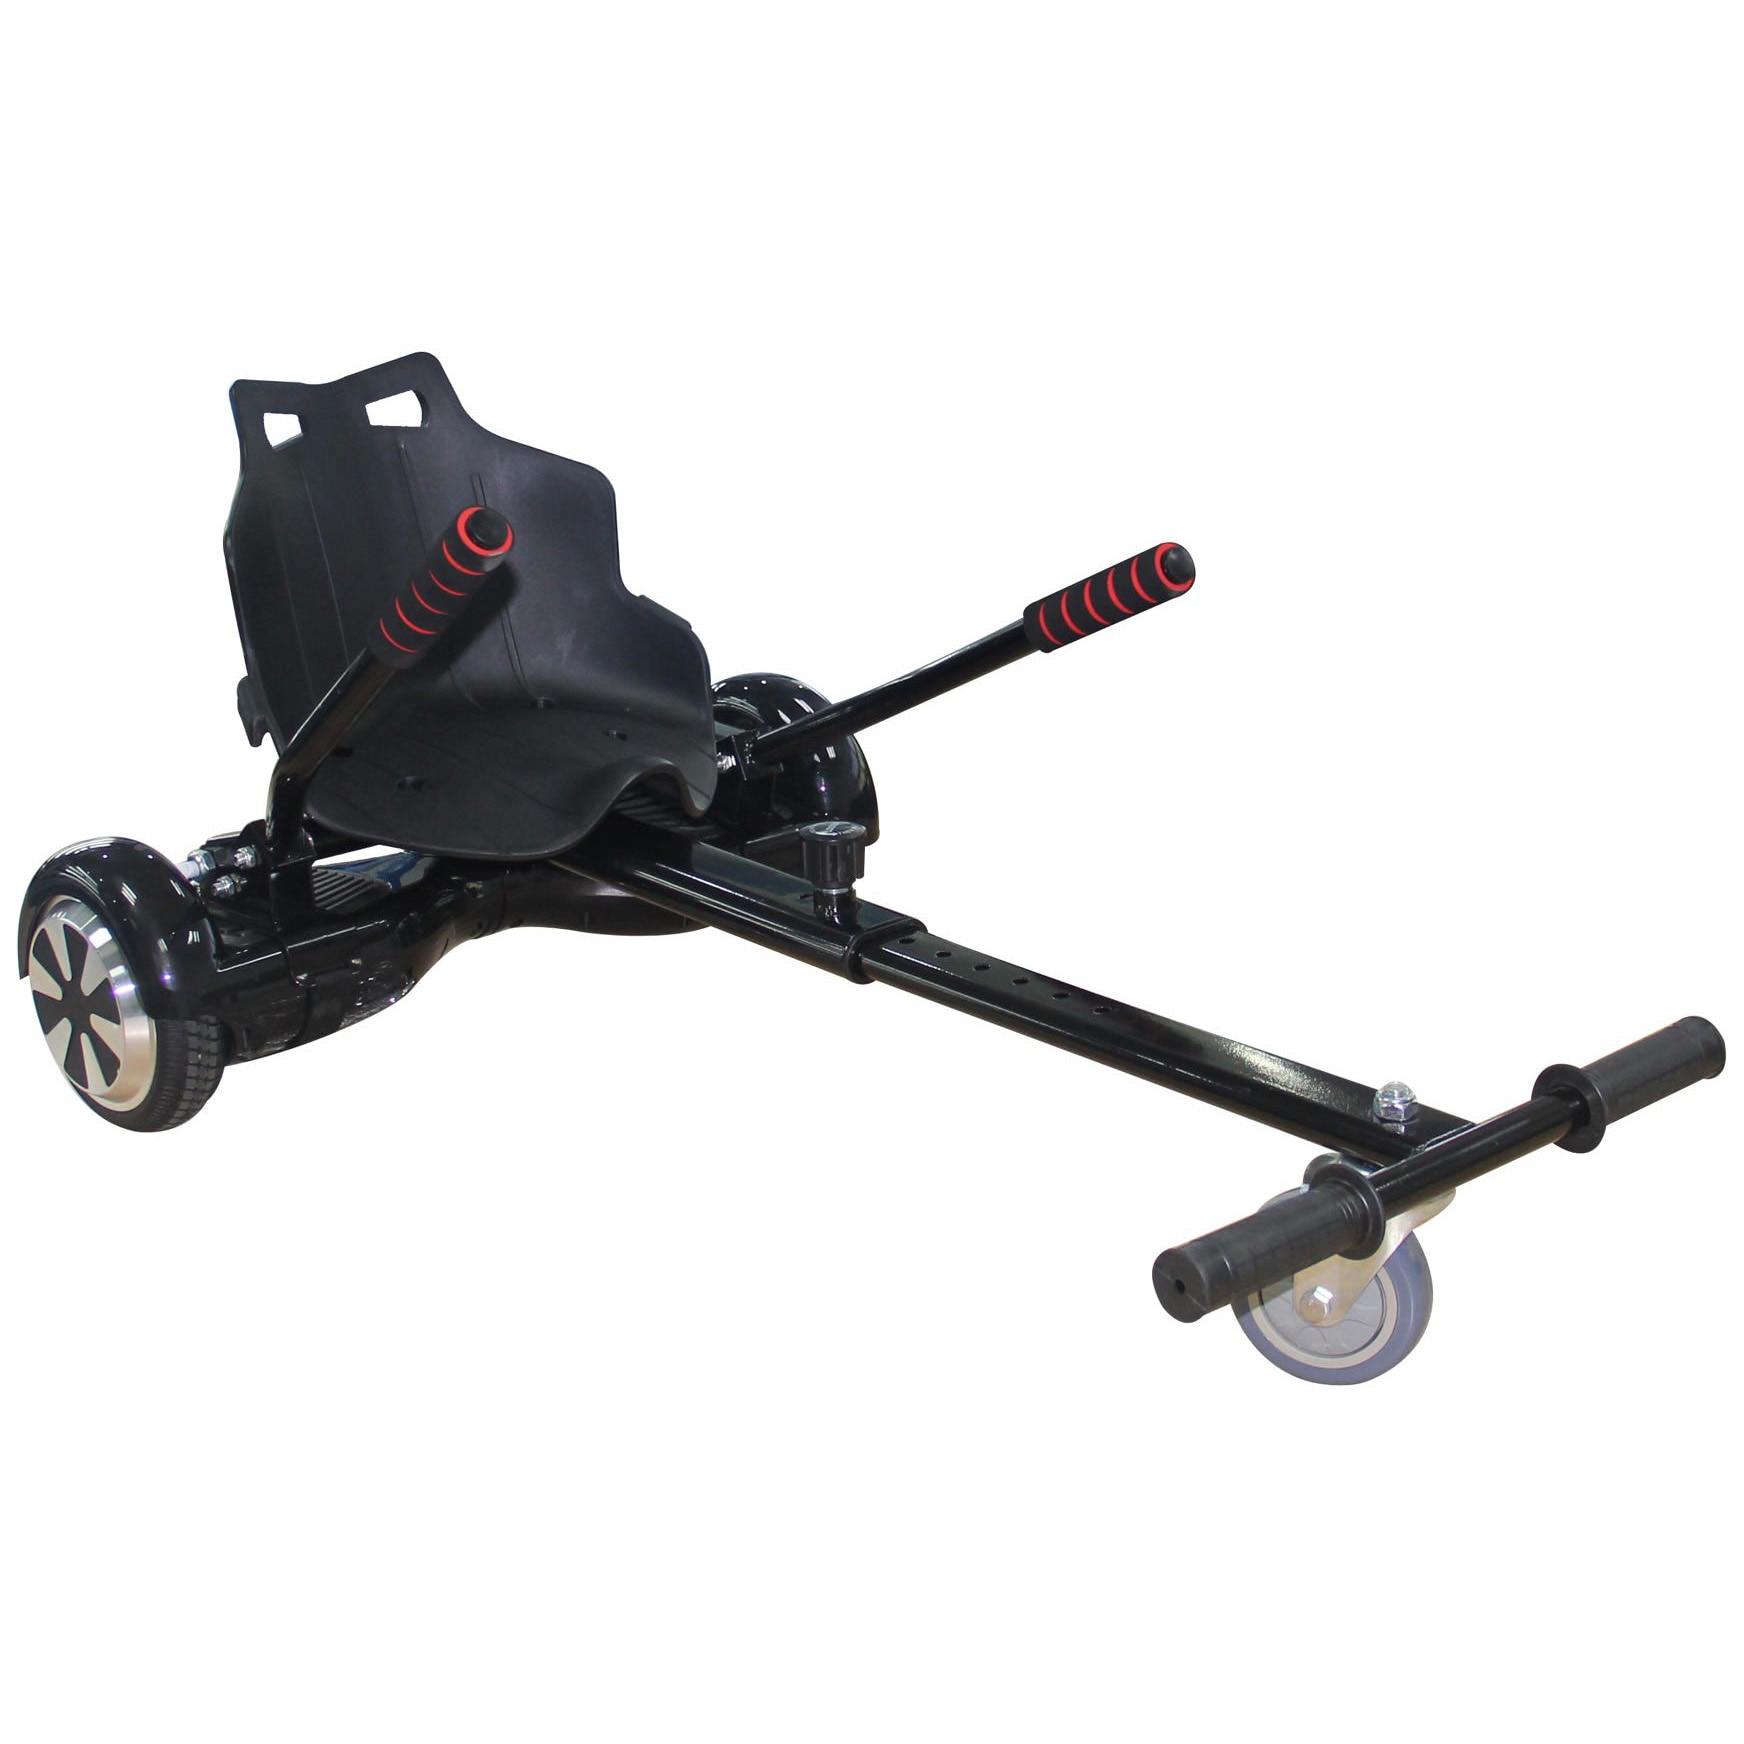 "Fotografie Hoverseat 2Drive, compatibil cu scooter electric de 6.5"", 8"", 8.5"", 10"", Negru"